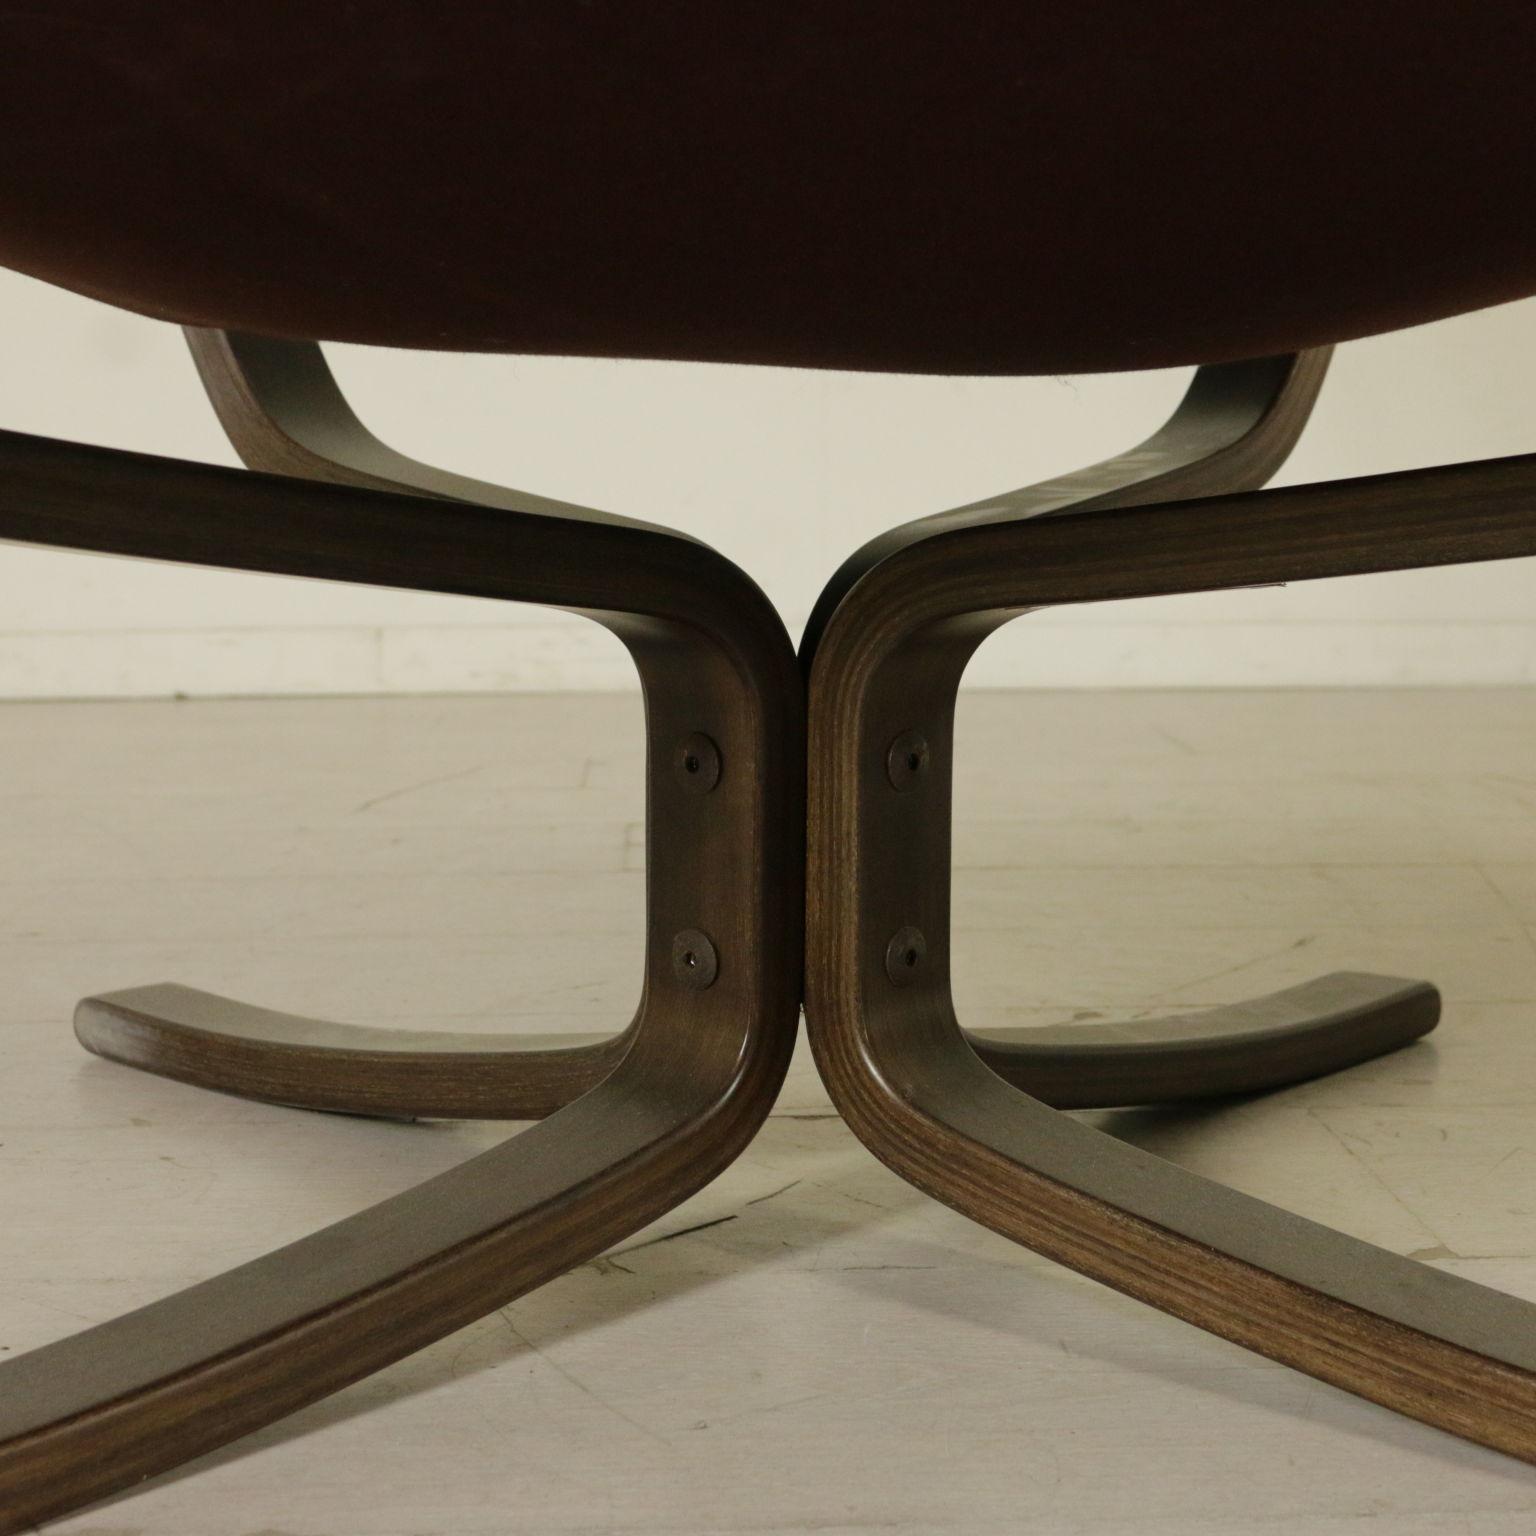 Viking Poltrona Frau.Armchair Designed For Frau Armchairs Modern